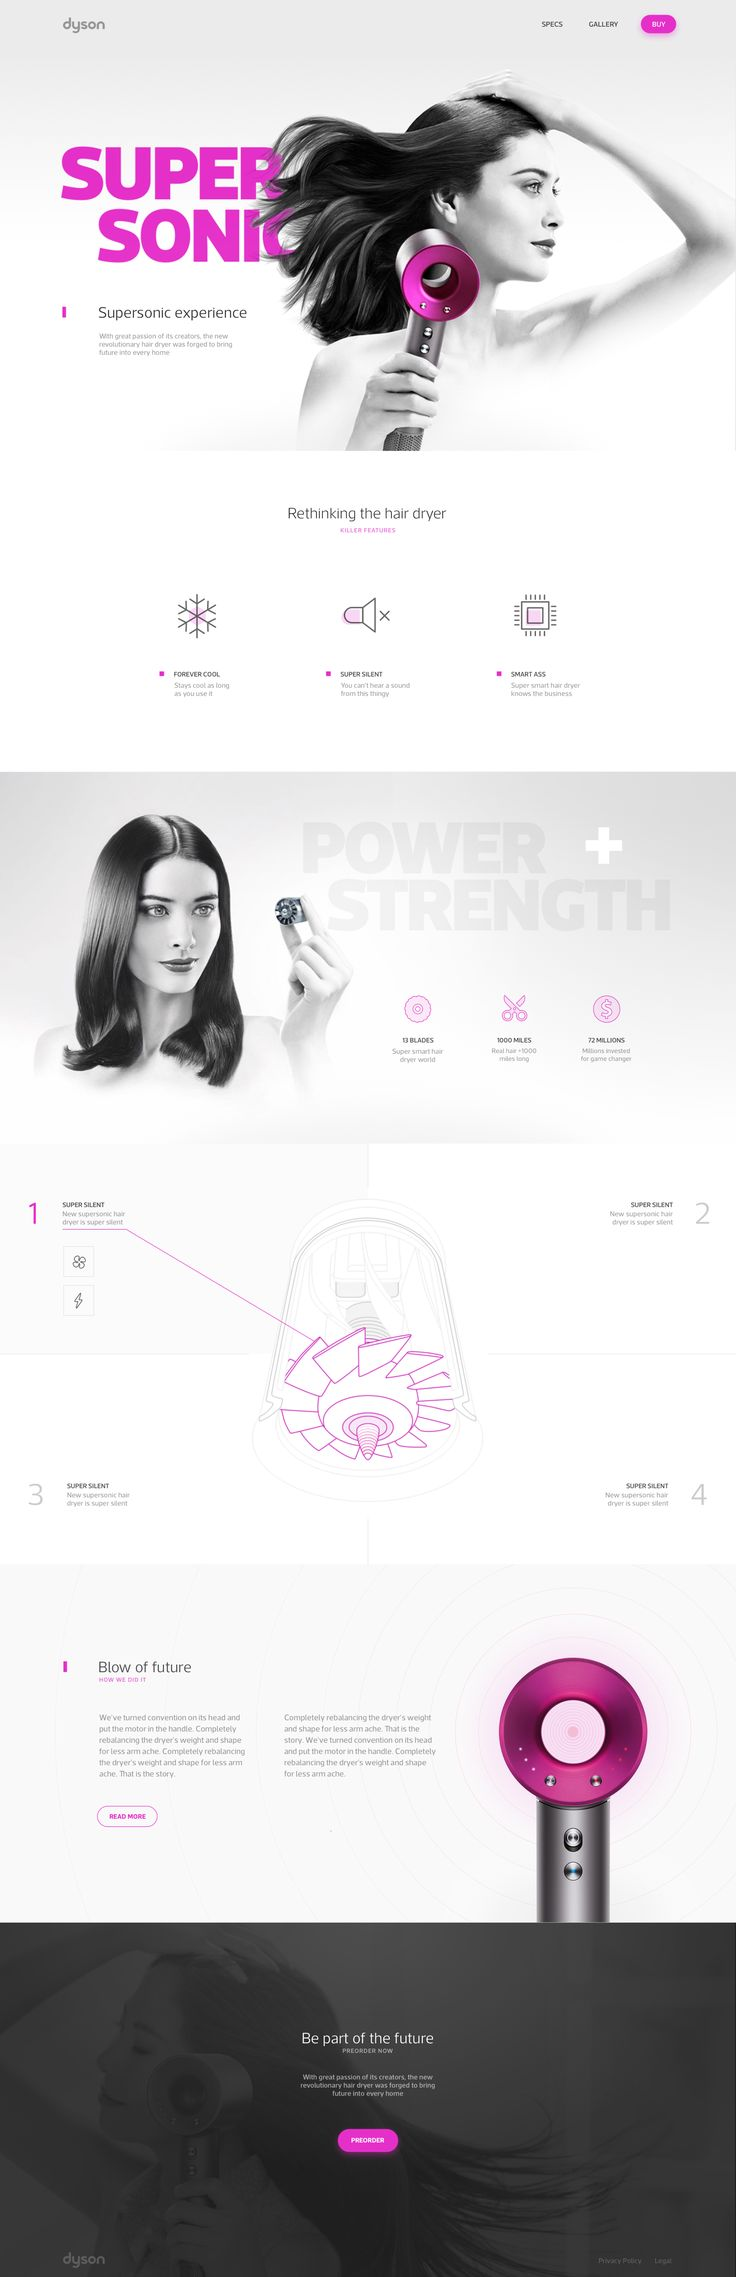 #website #design #webdesign Supersonic